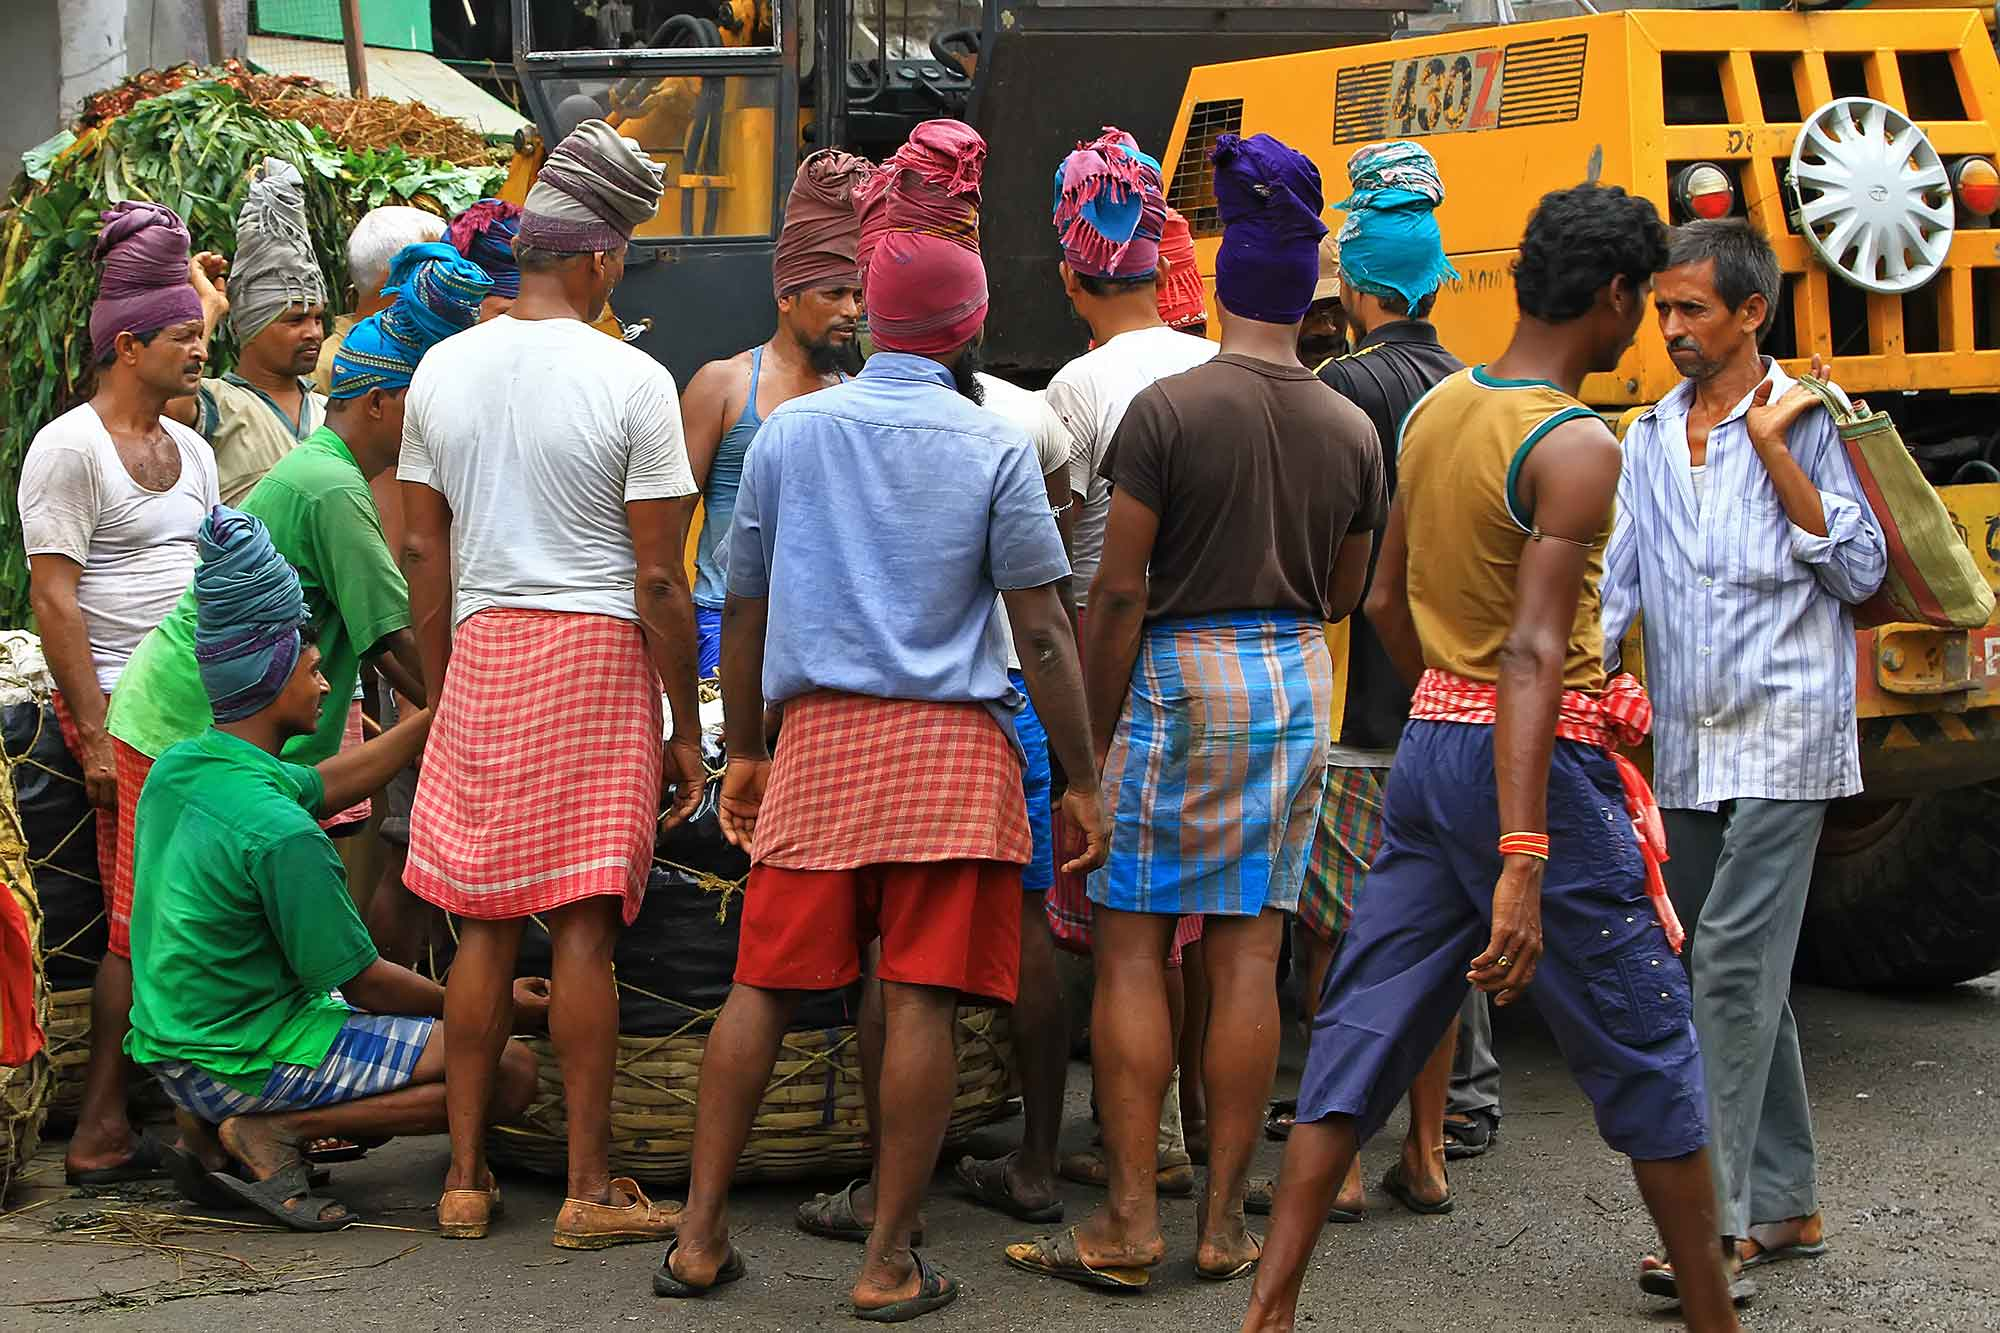 fruit-wholesale-market-kolkata-india-working-men